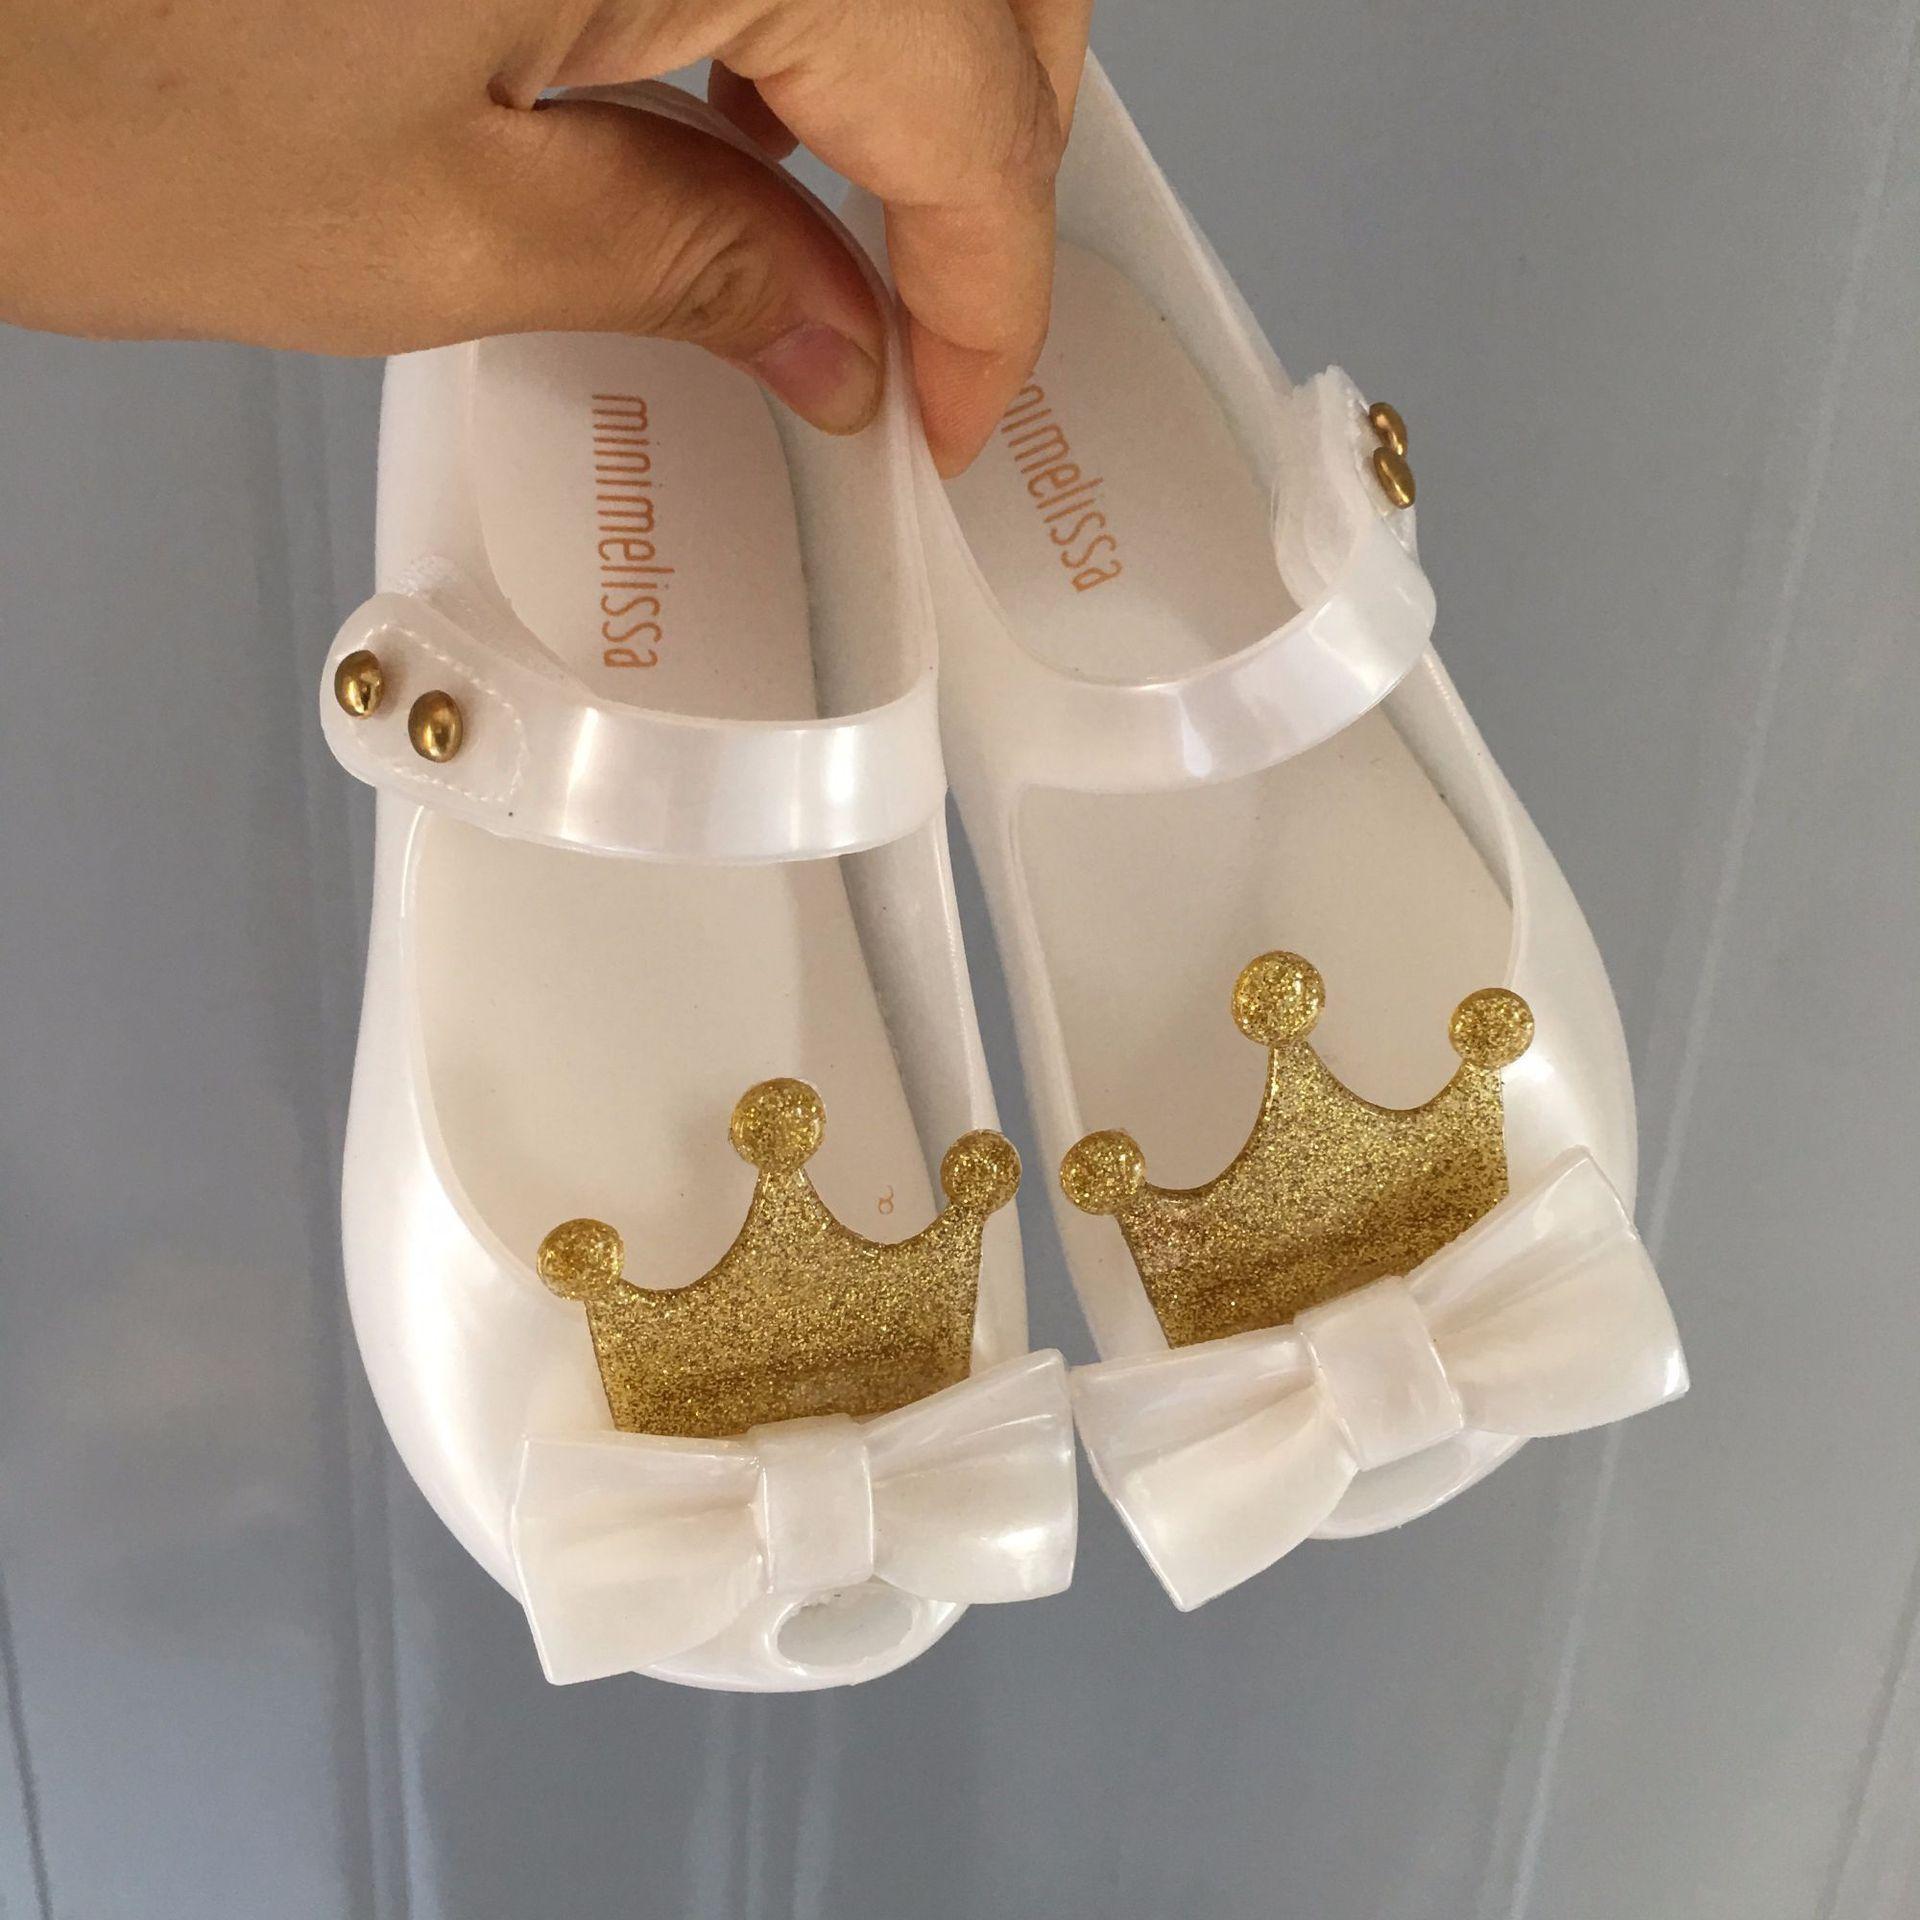 Mini Melissa Ultragirl 2019 Original Girl Jelly Sandals Crown Kids Sandals Children Beach Shoes Non-slip Melissa Toddler SH19077